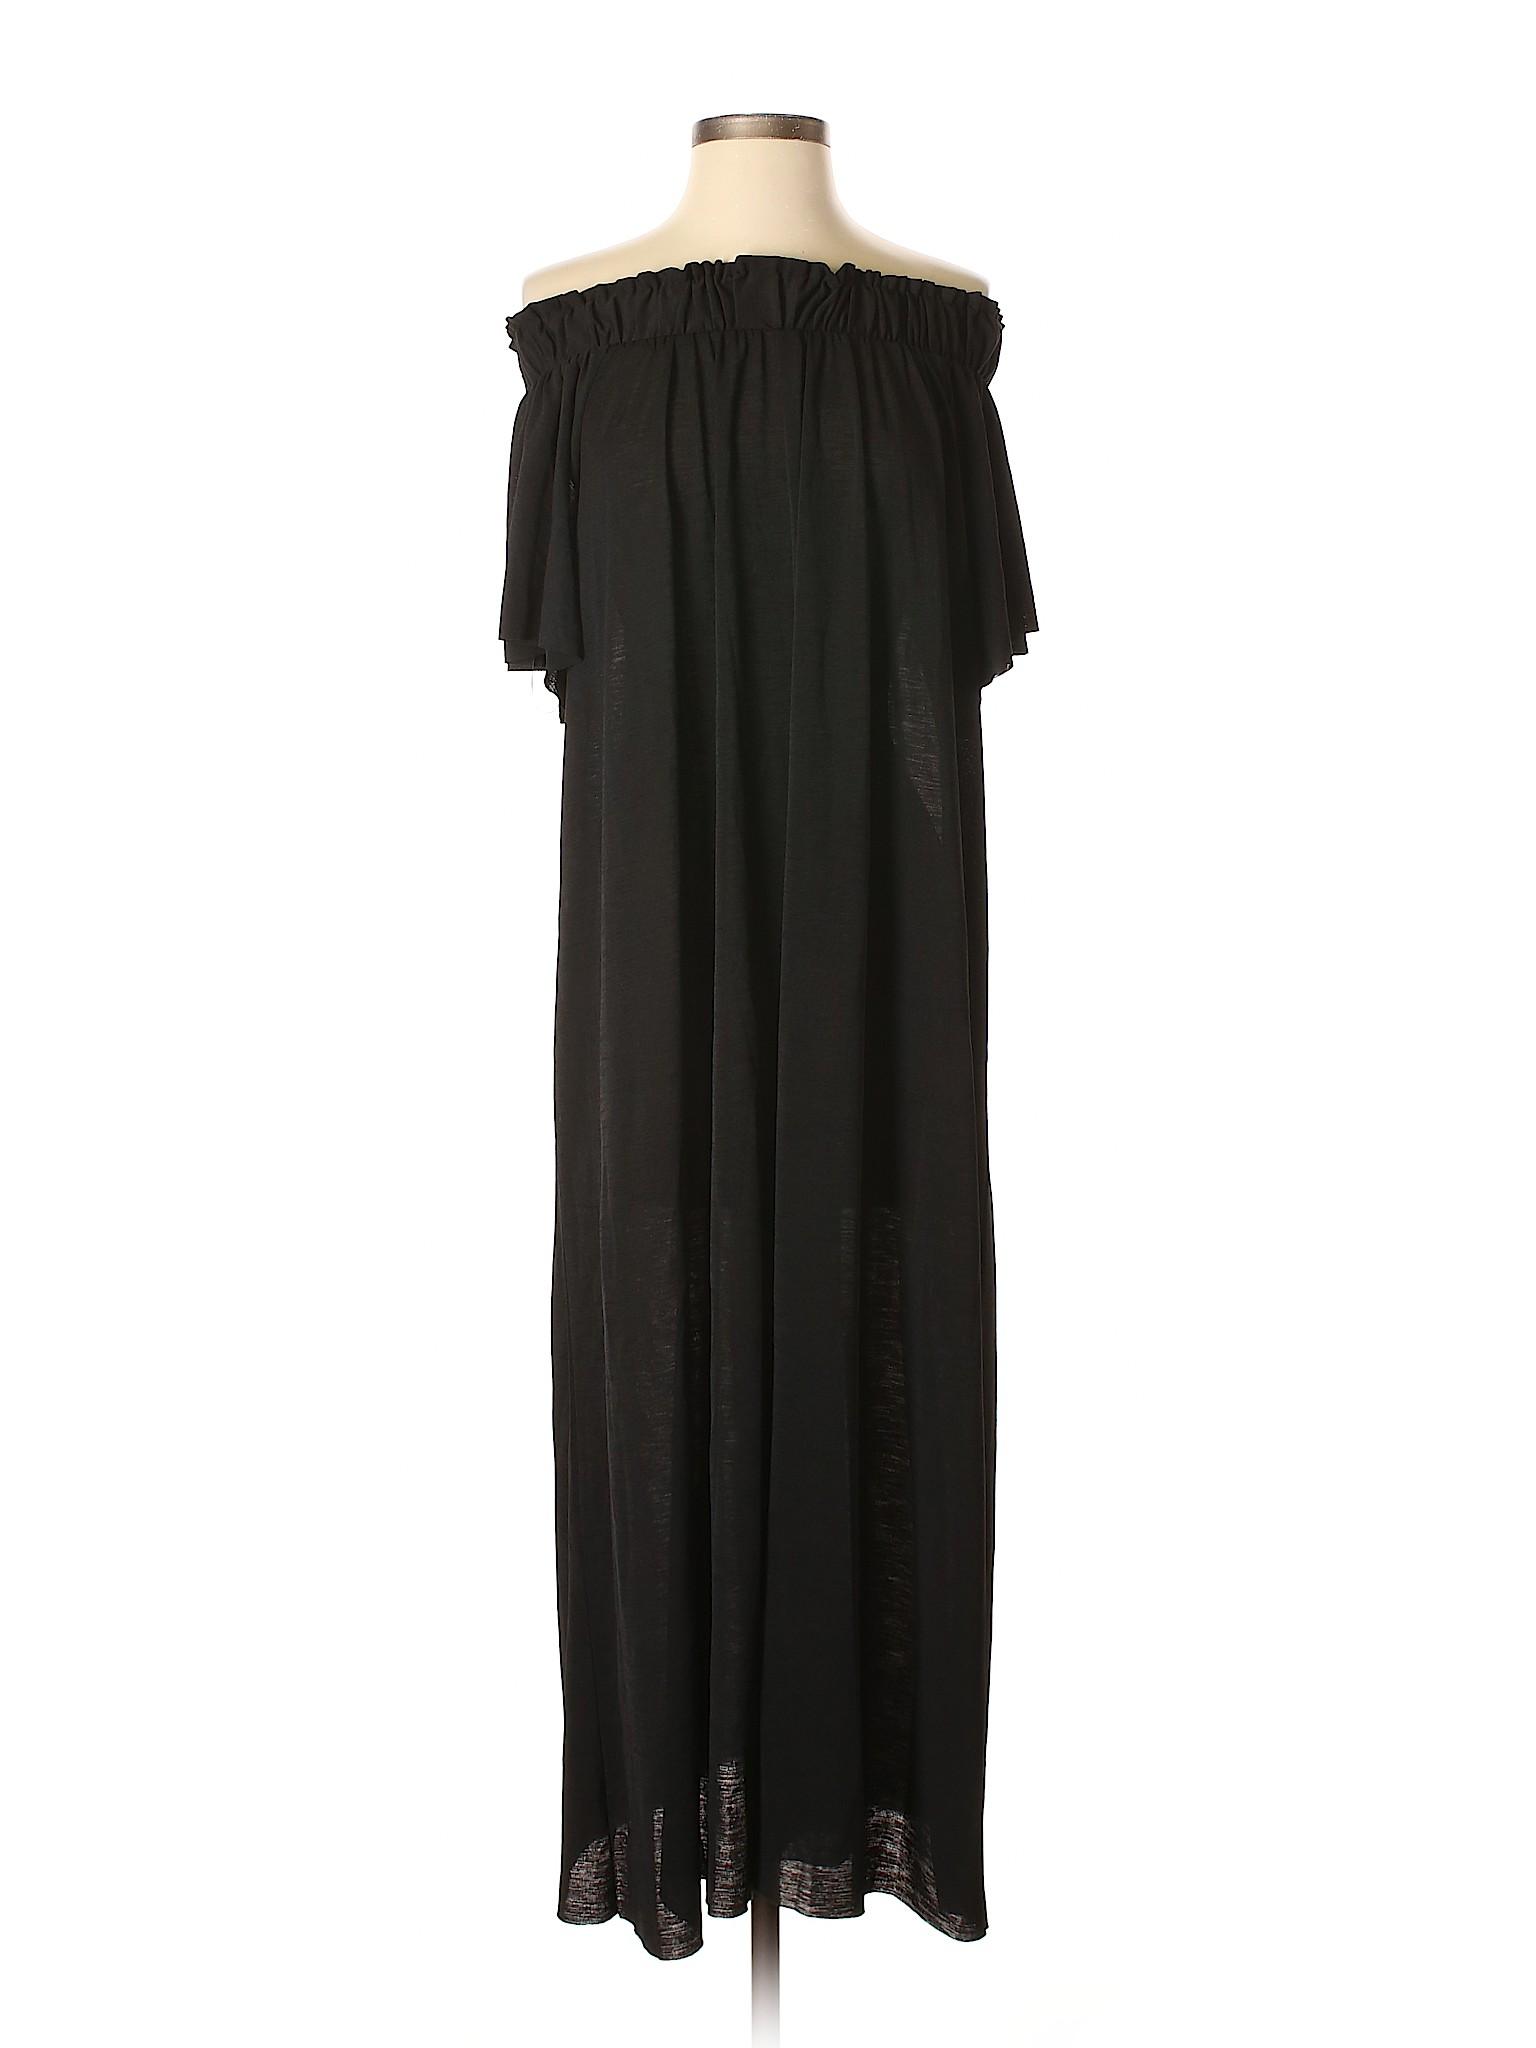 winter Dress Collection Casual Zara W amp;B Boutique PIwRSdvqSx ...